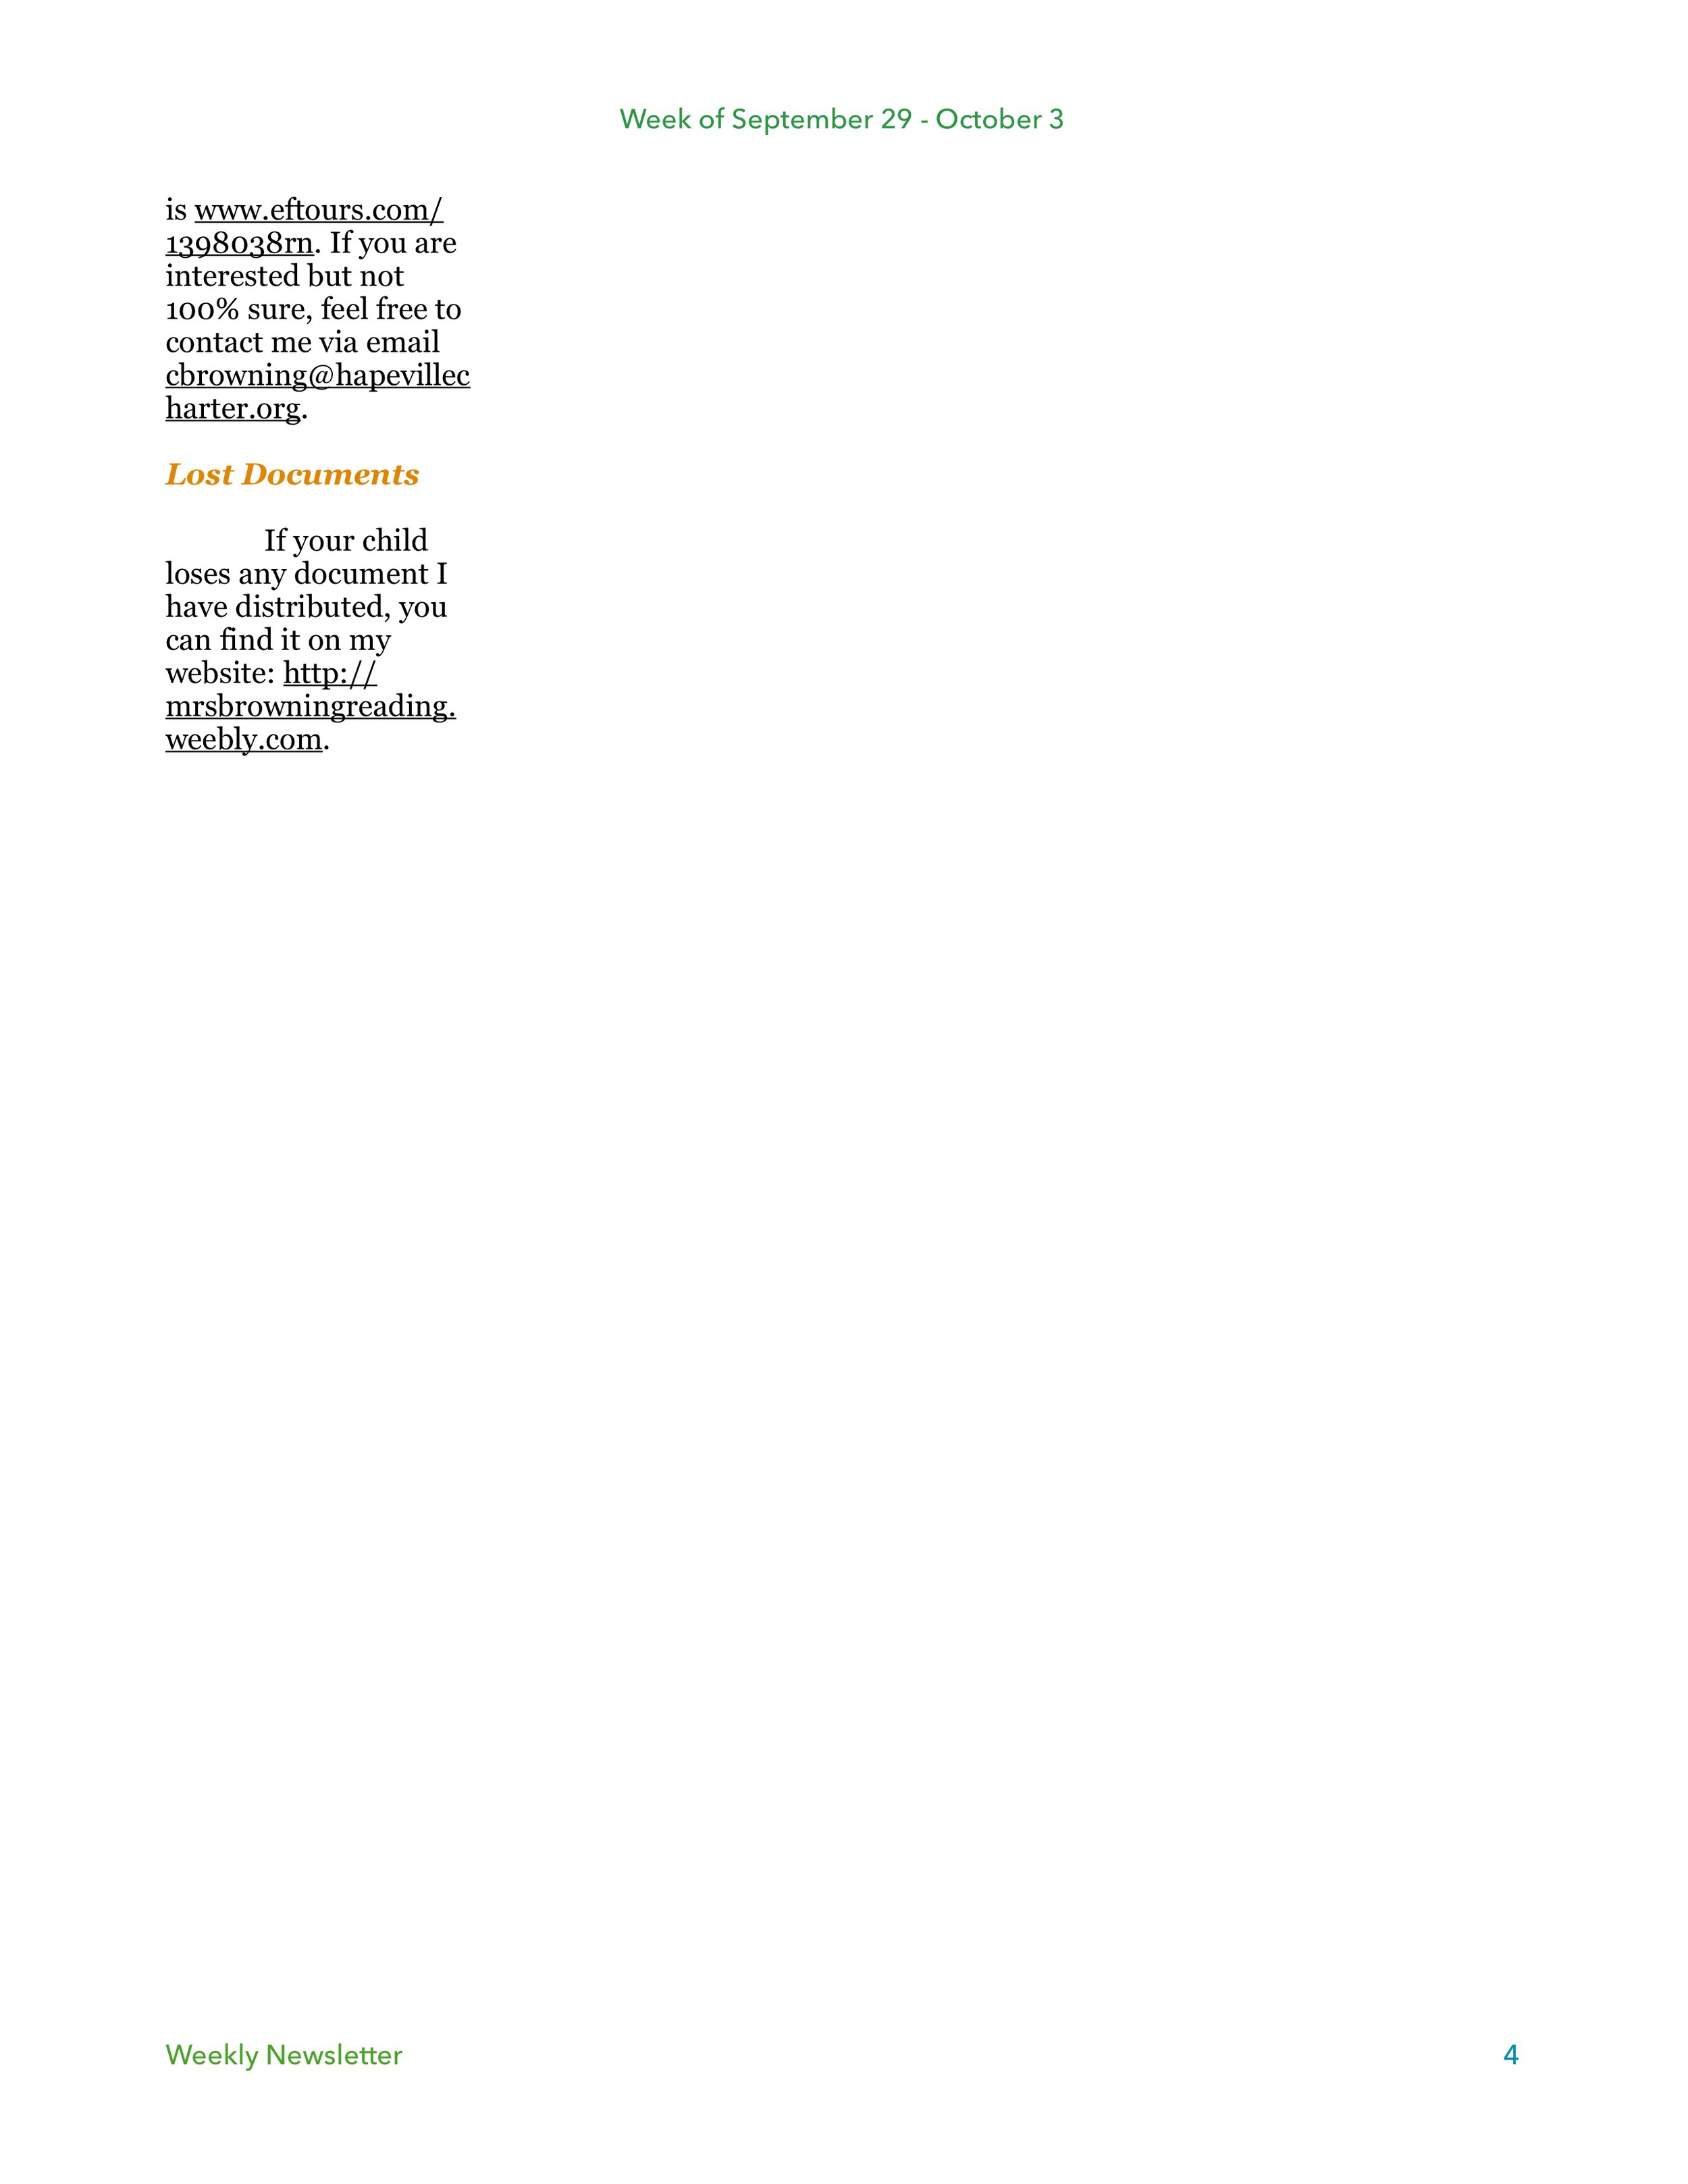 Newsletter Image6th grade 9-29 4.jpeg